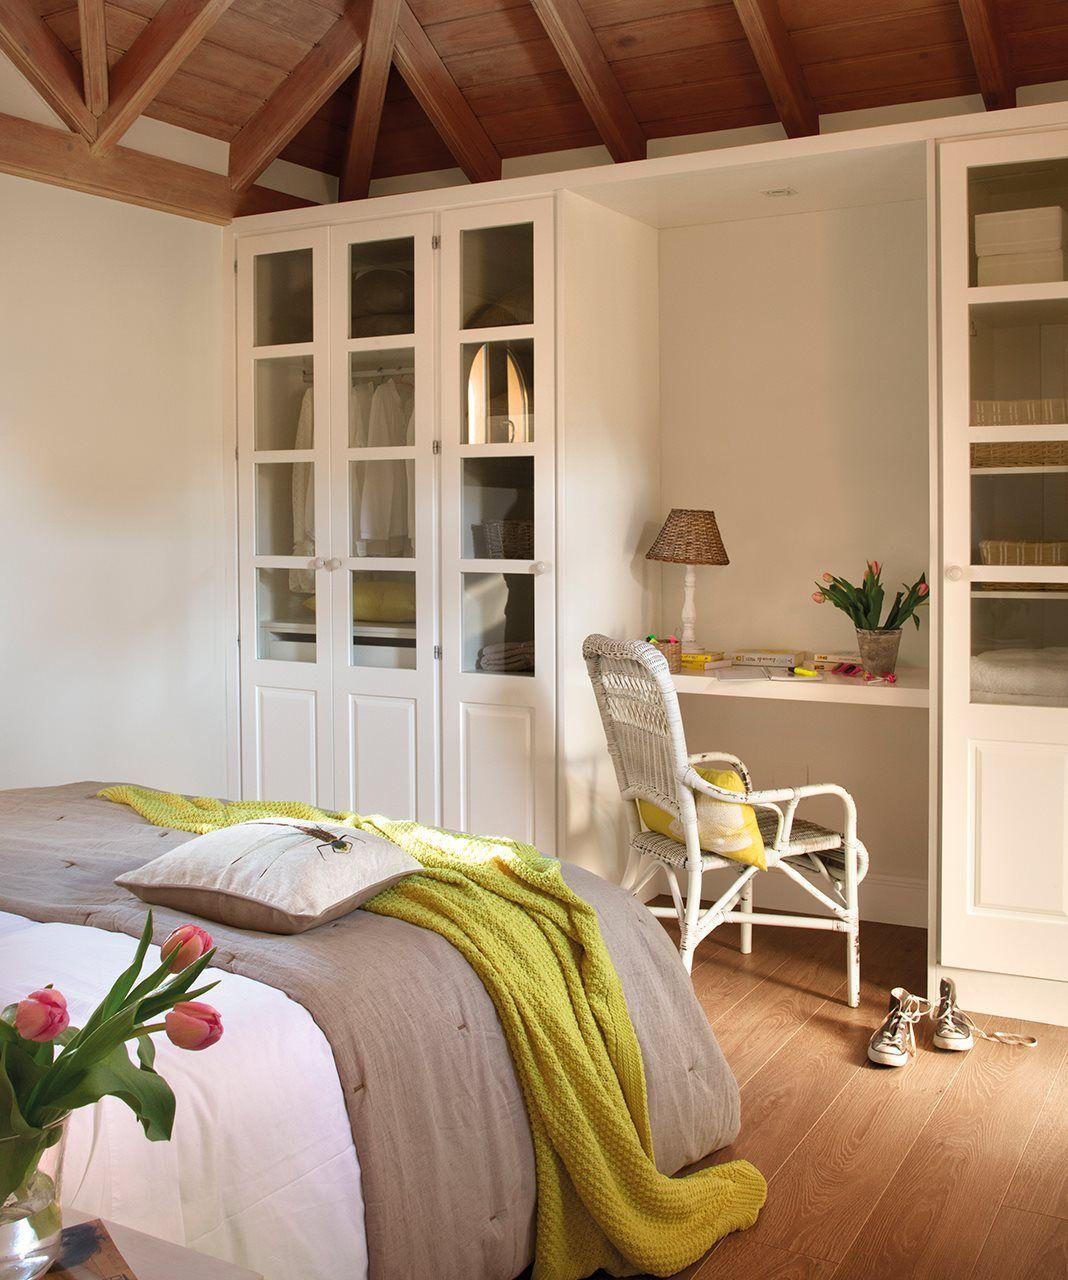 10 ideas para aprovechar rincones dif ciles for Deco dormitorios infantiles